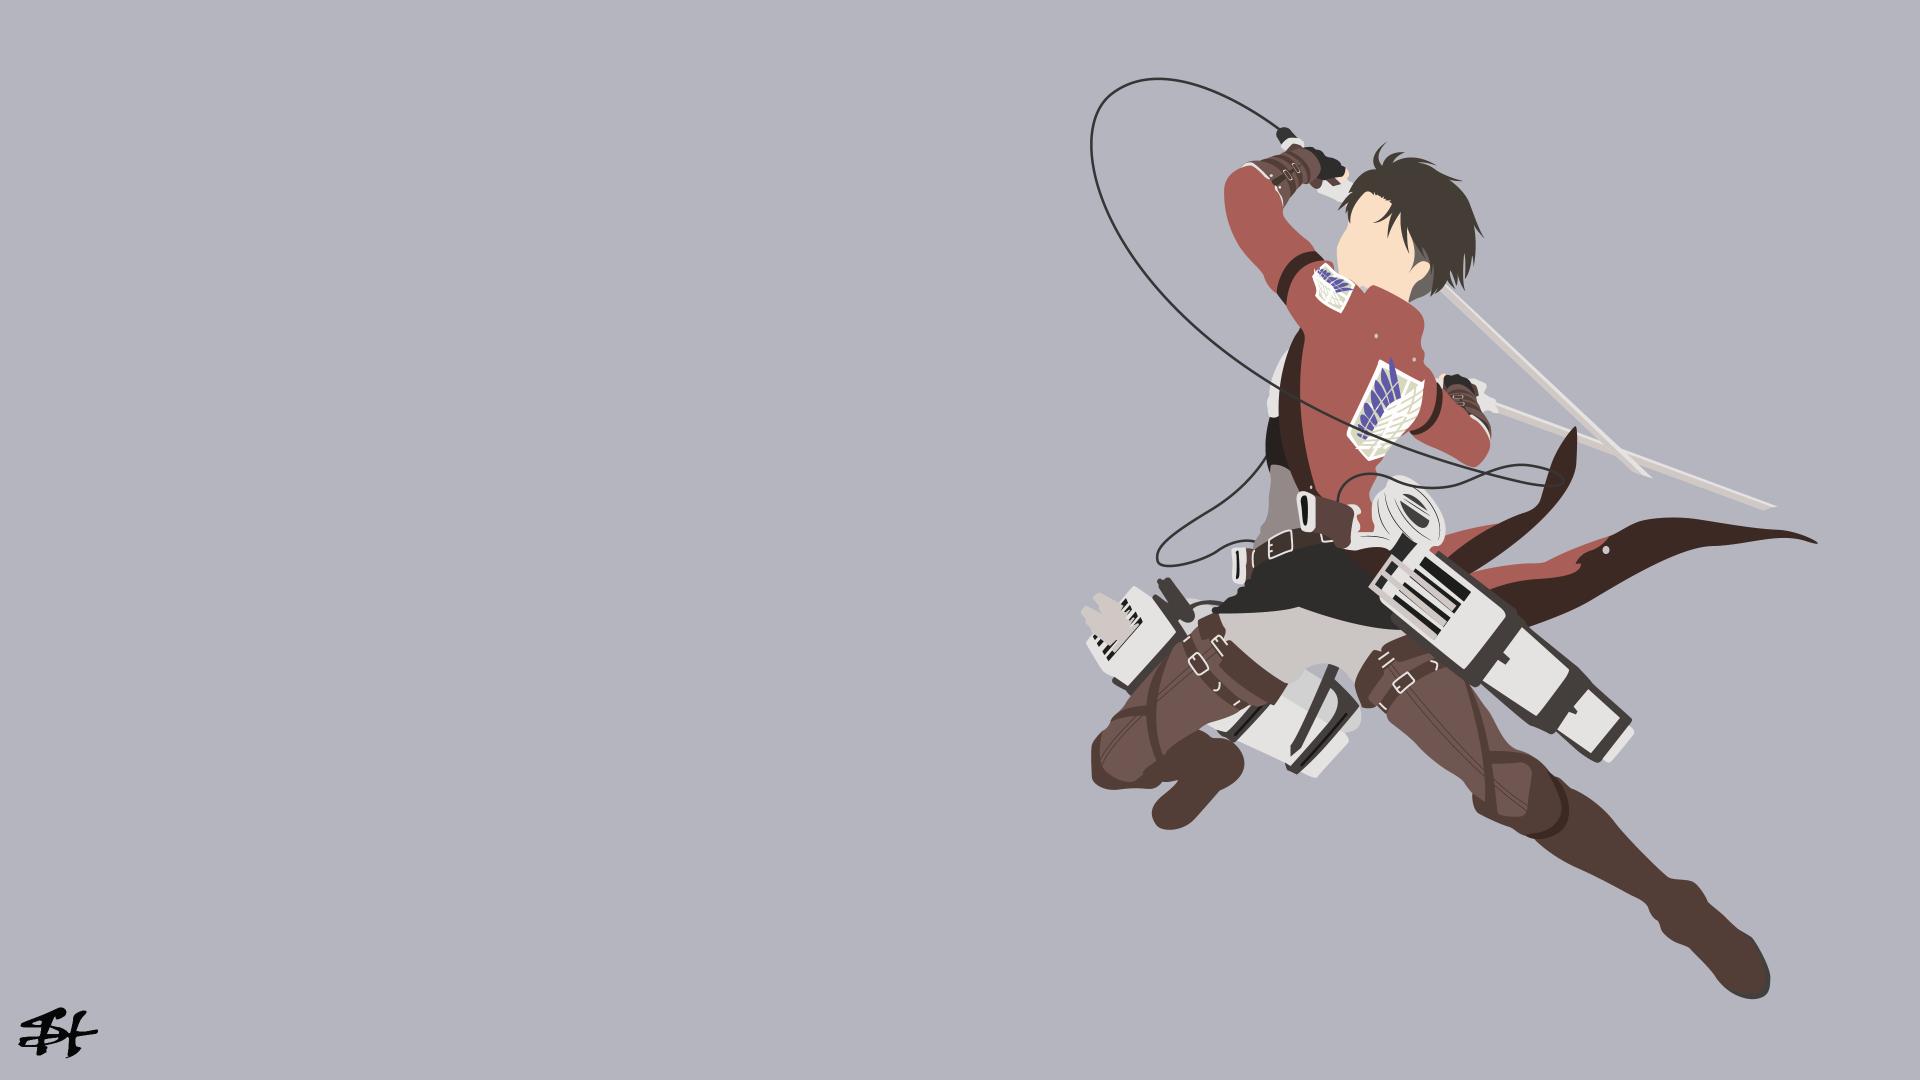 Attack on titan · eren yeager · minimalist; Anime Attack On Titan Levi Ackerman Wallpaper   Minimalist ...